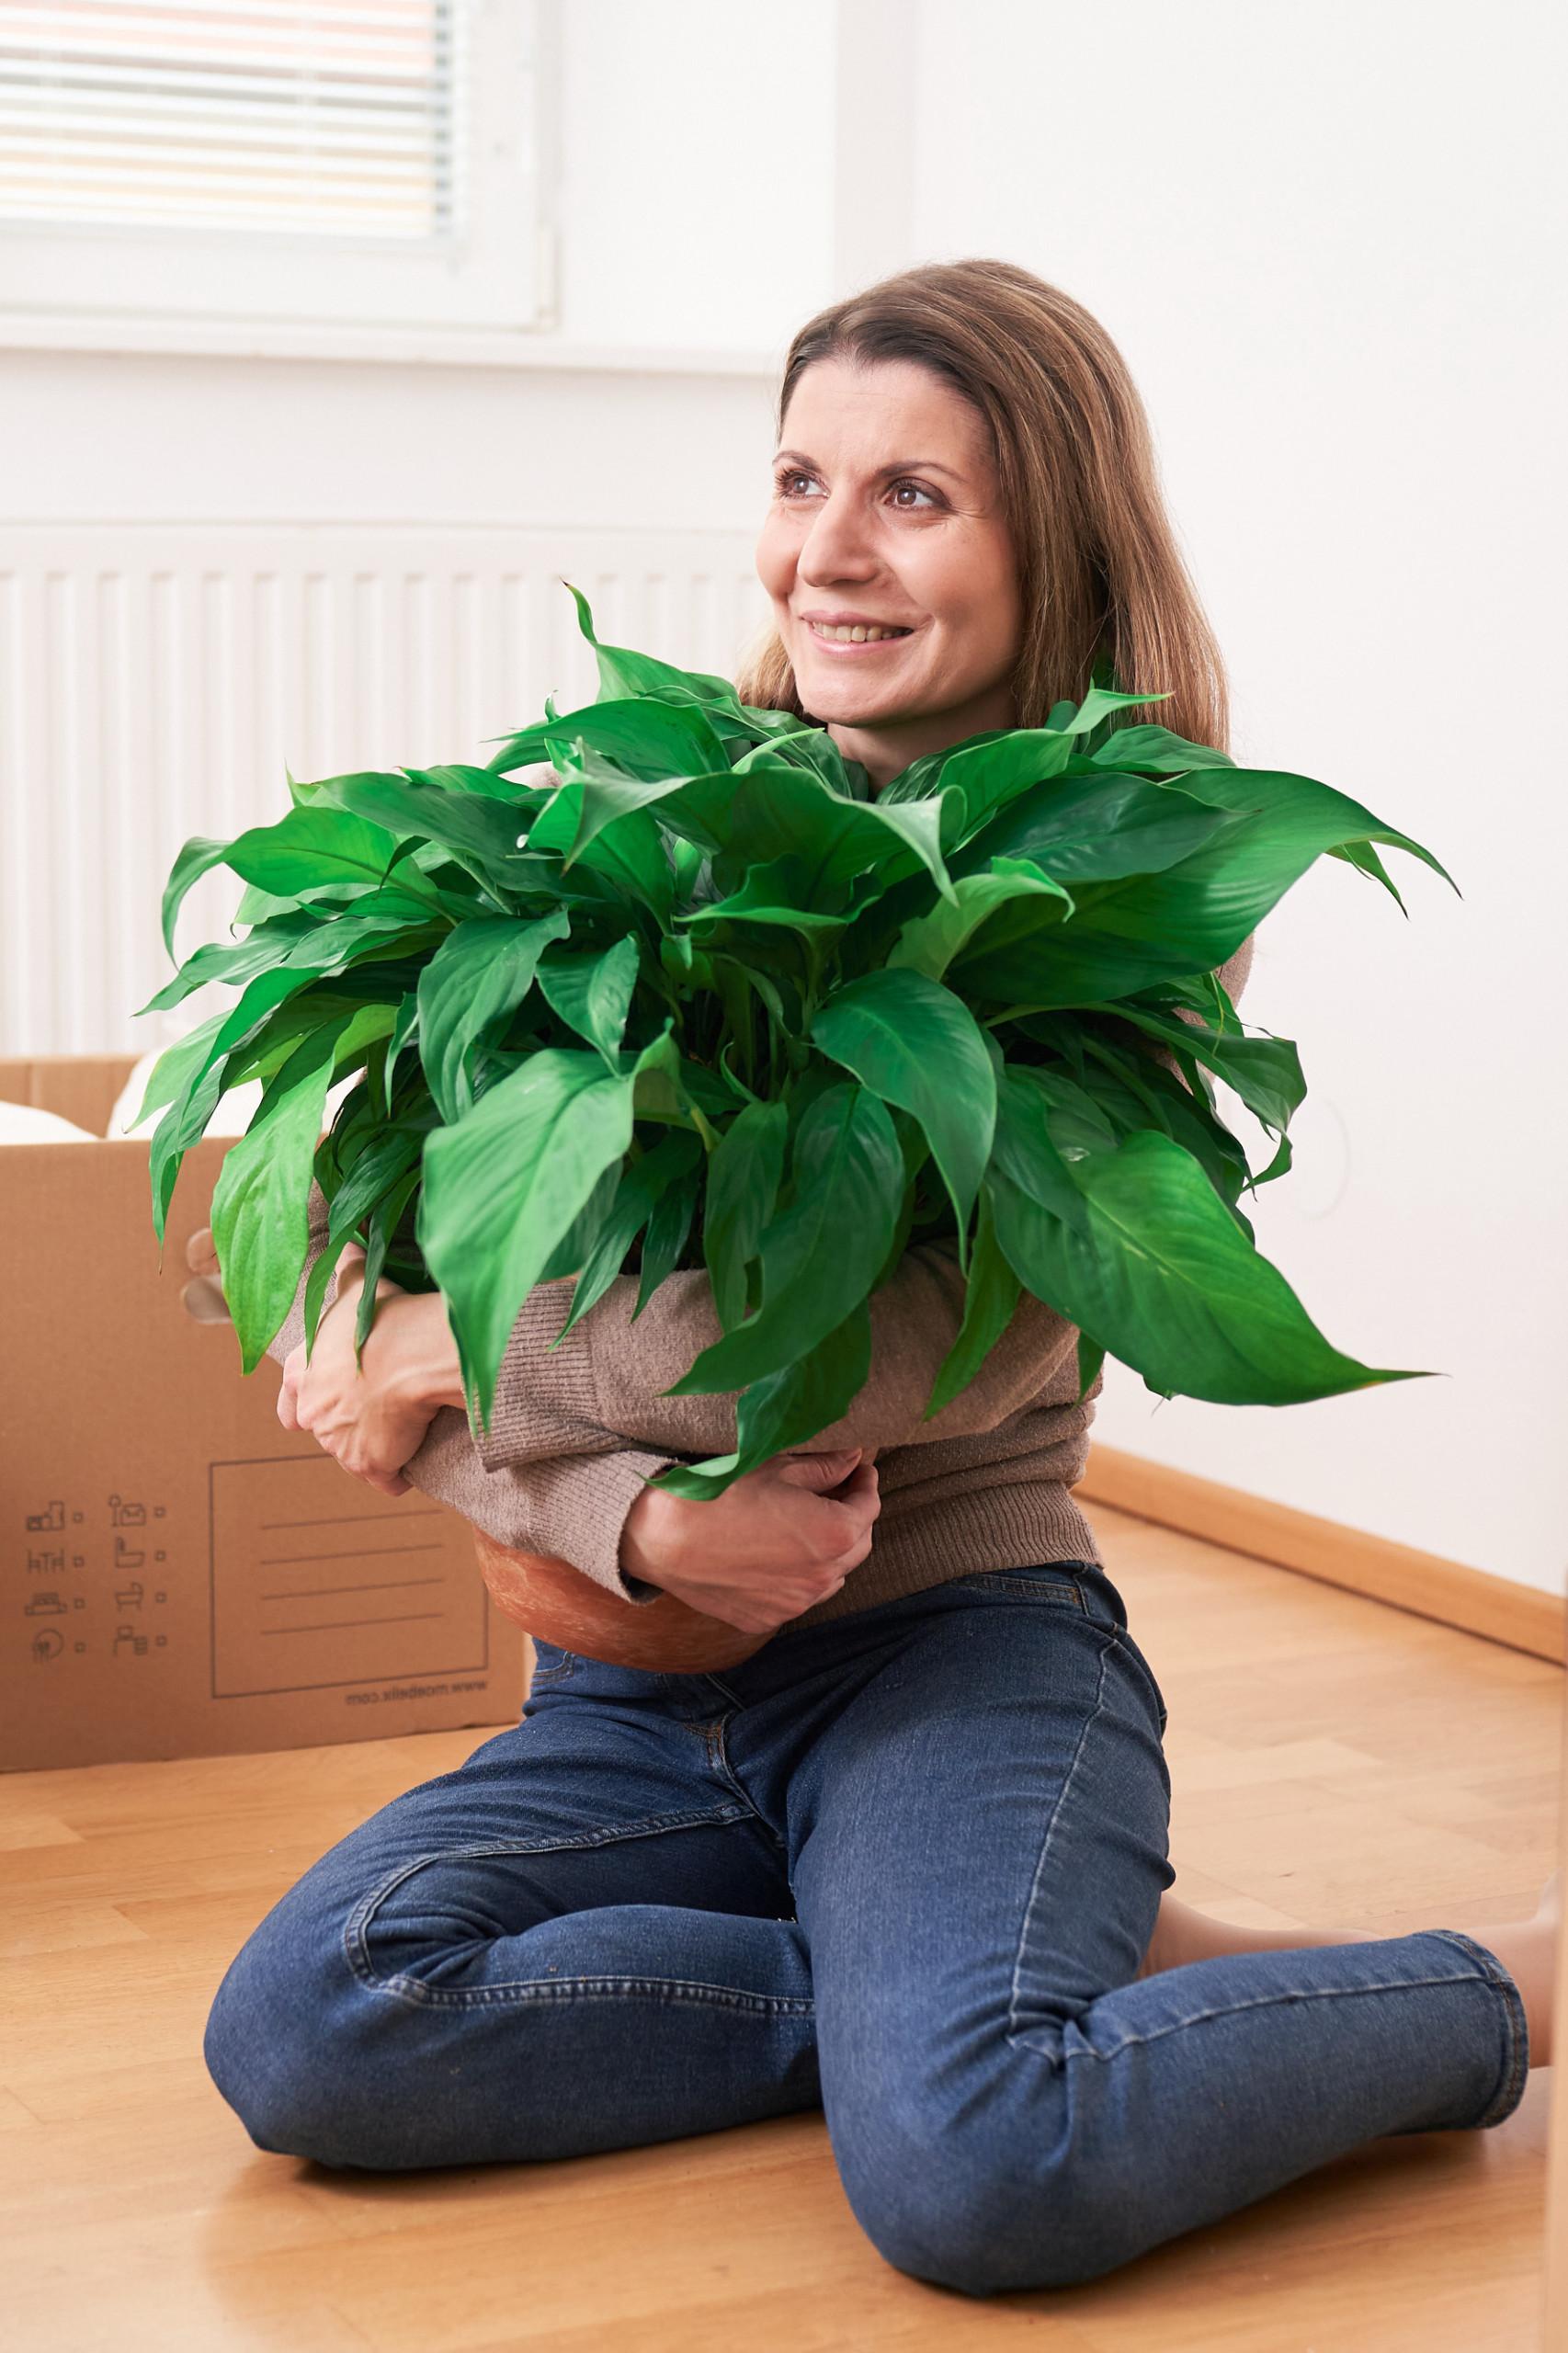 Frau mit Pflanze